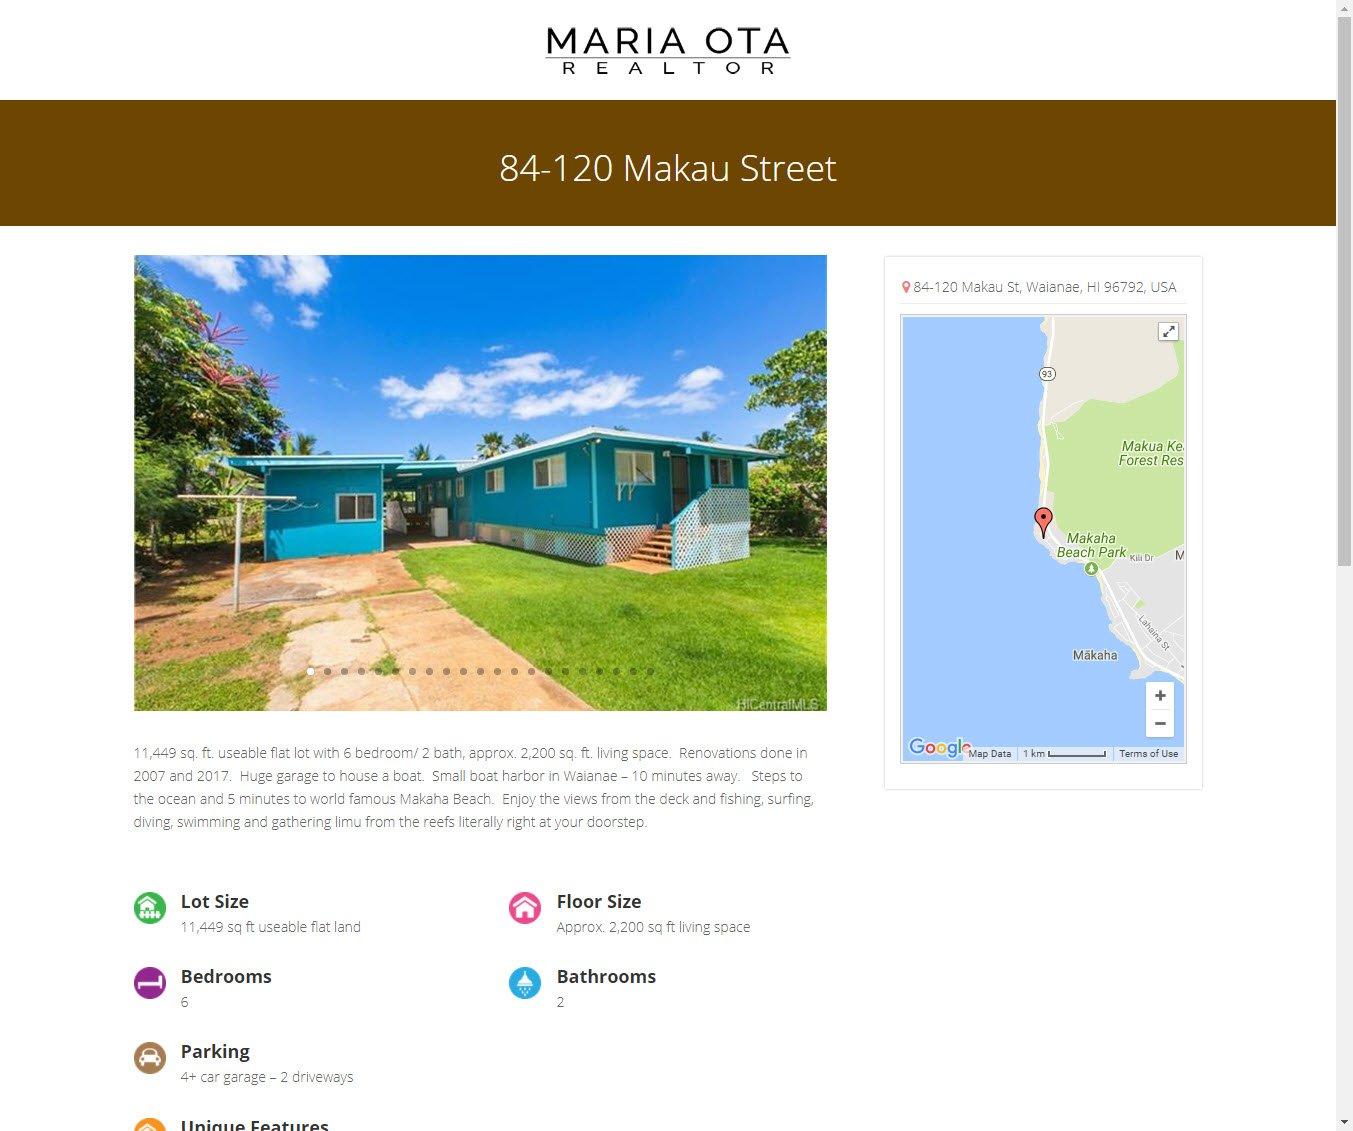 Maria Ota, Realtor